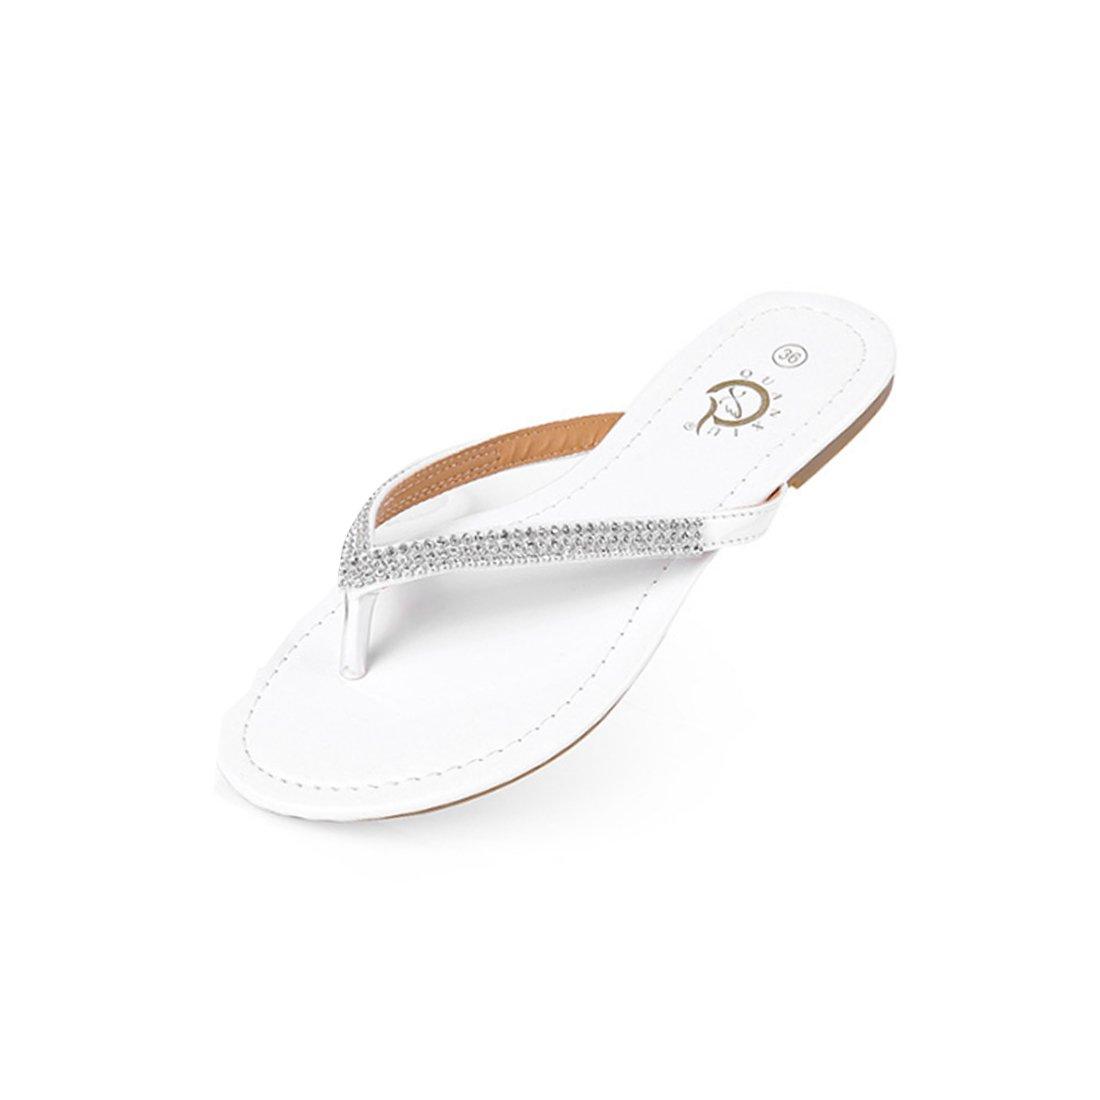 Niceful Women's Flat Rhinestone Flip Flops PU Large Size Casual Summer Sandals B07BKXZ37T 6.5 B(M) US|White